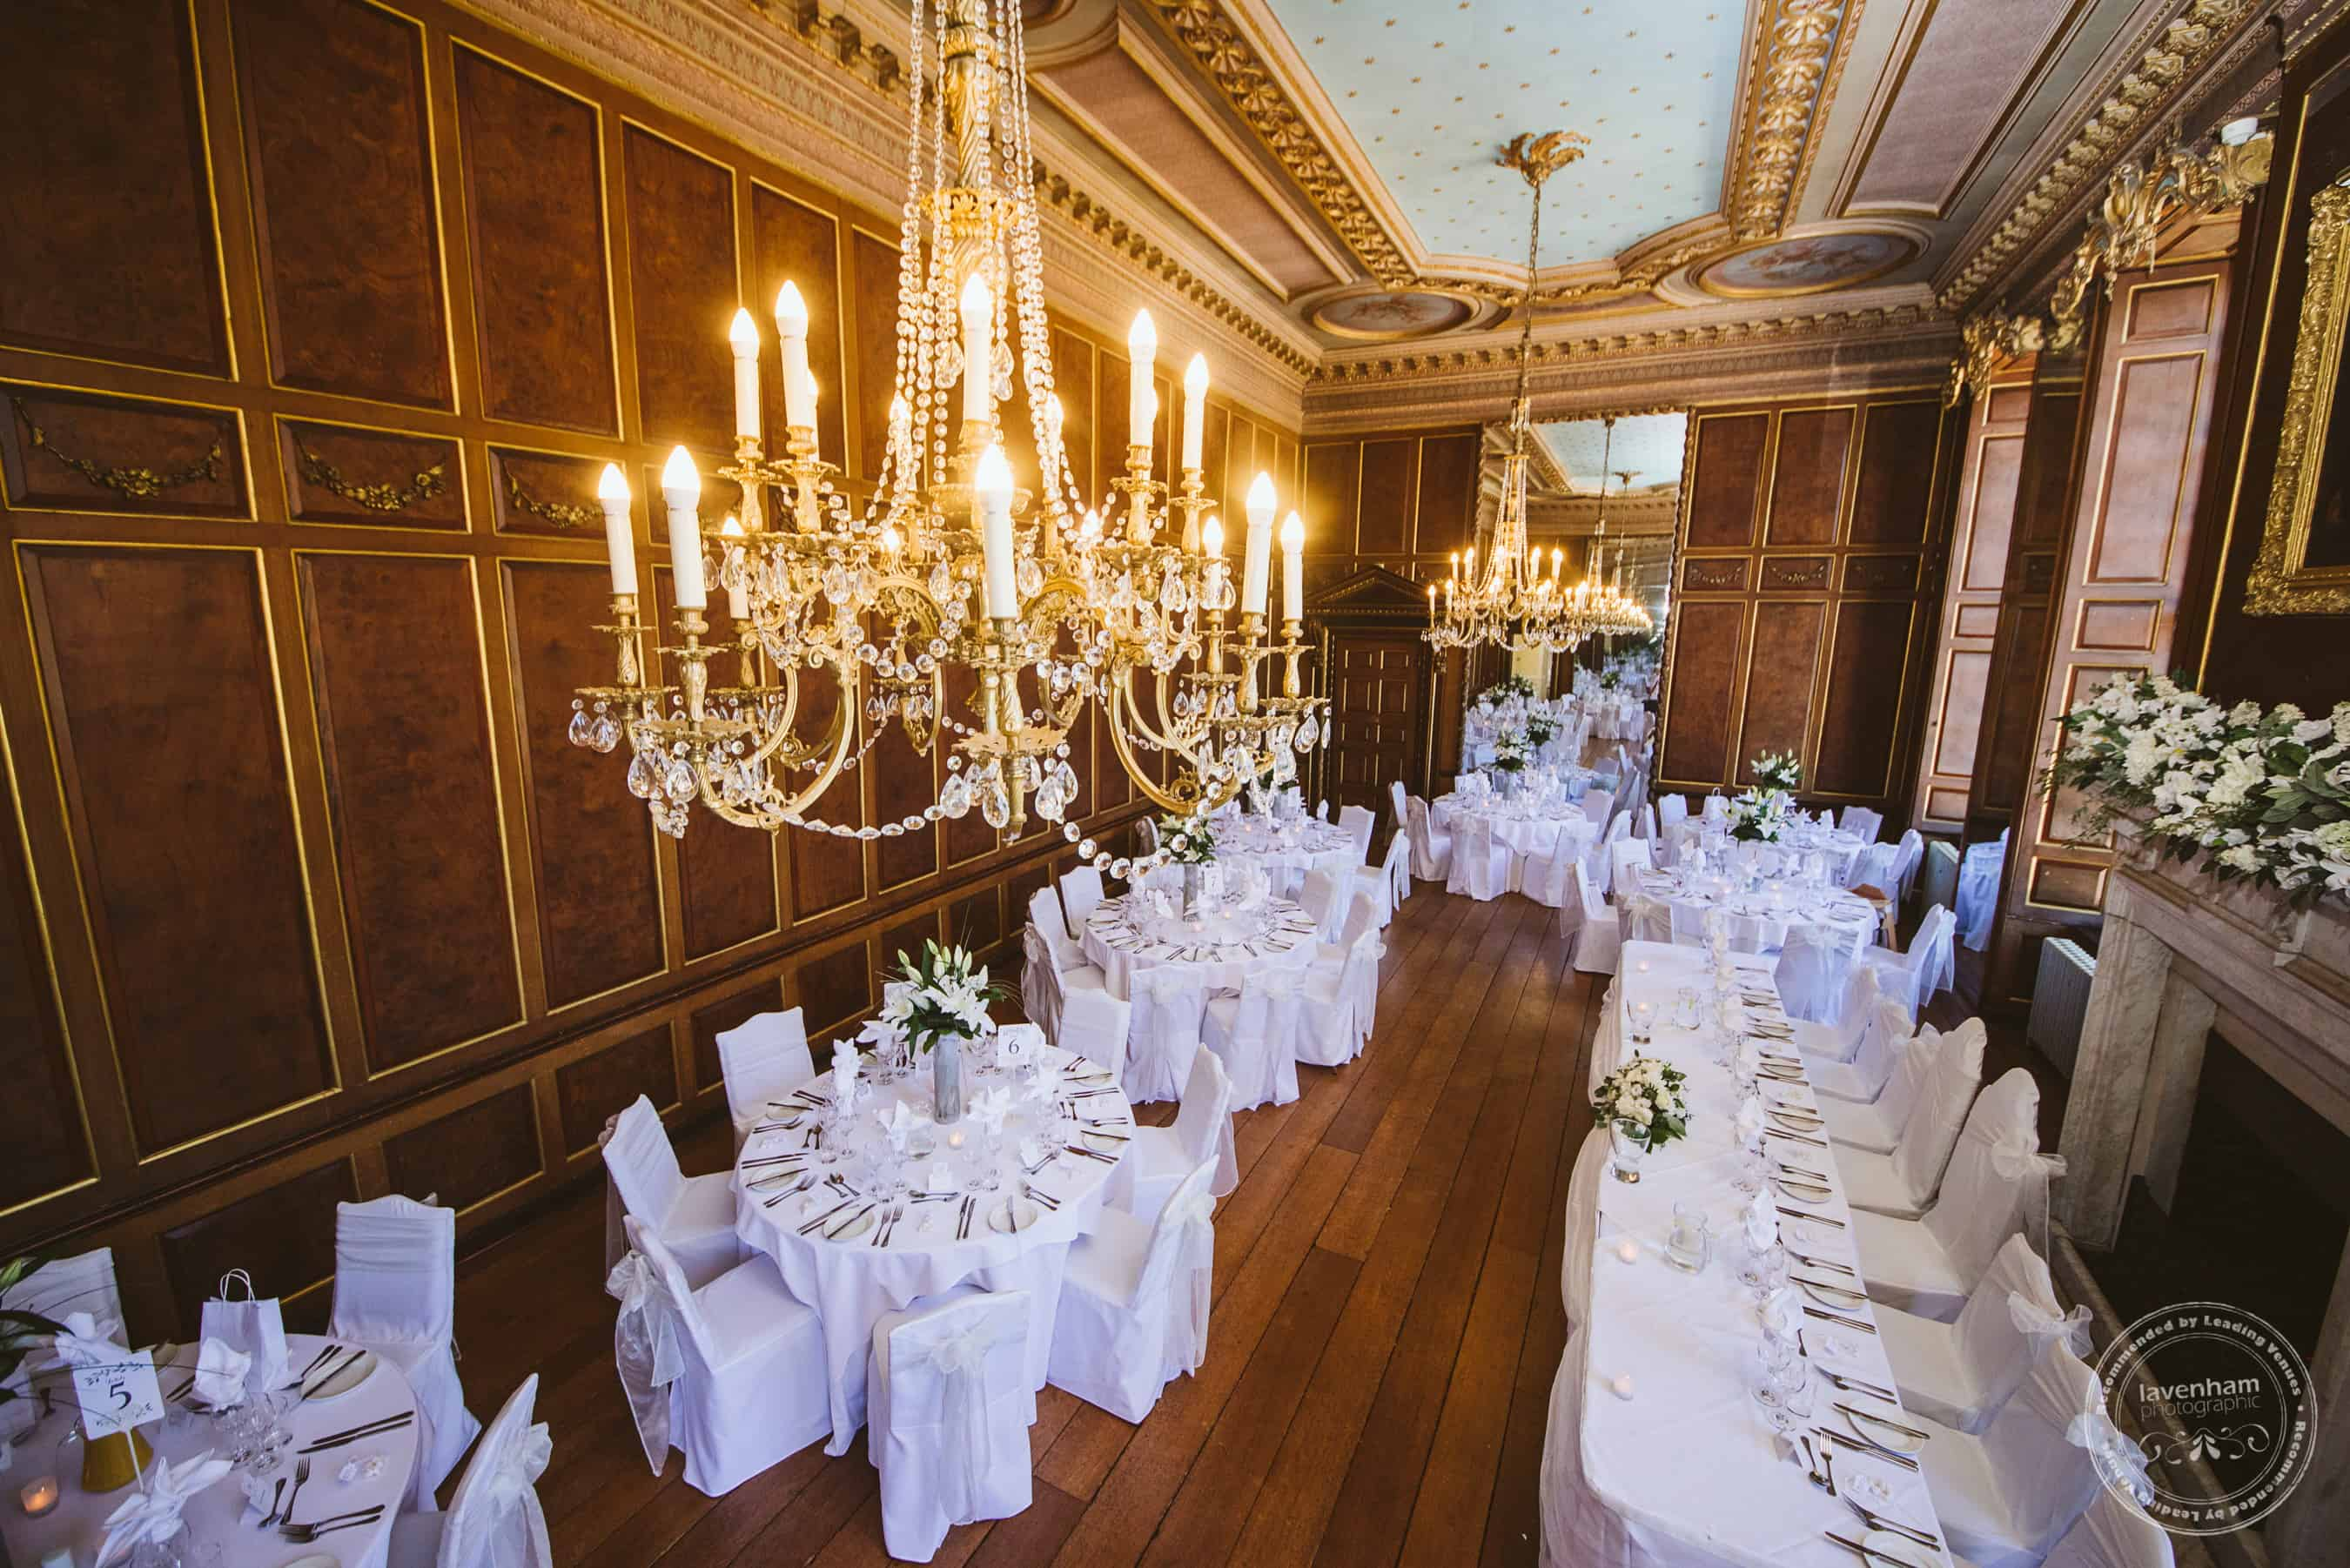 220618 Gosfield Hall Wedding Photography Lavenham Photographic 0138